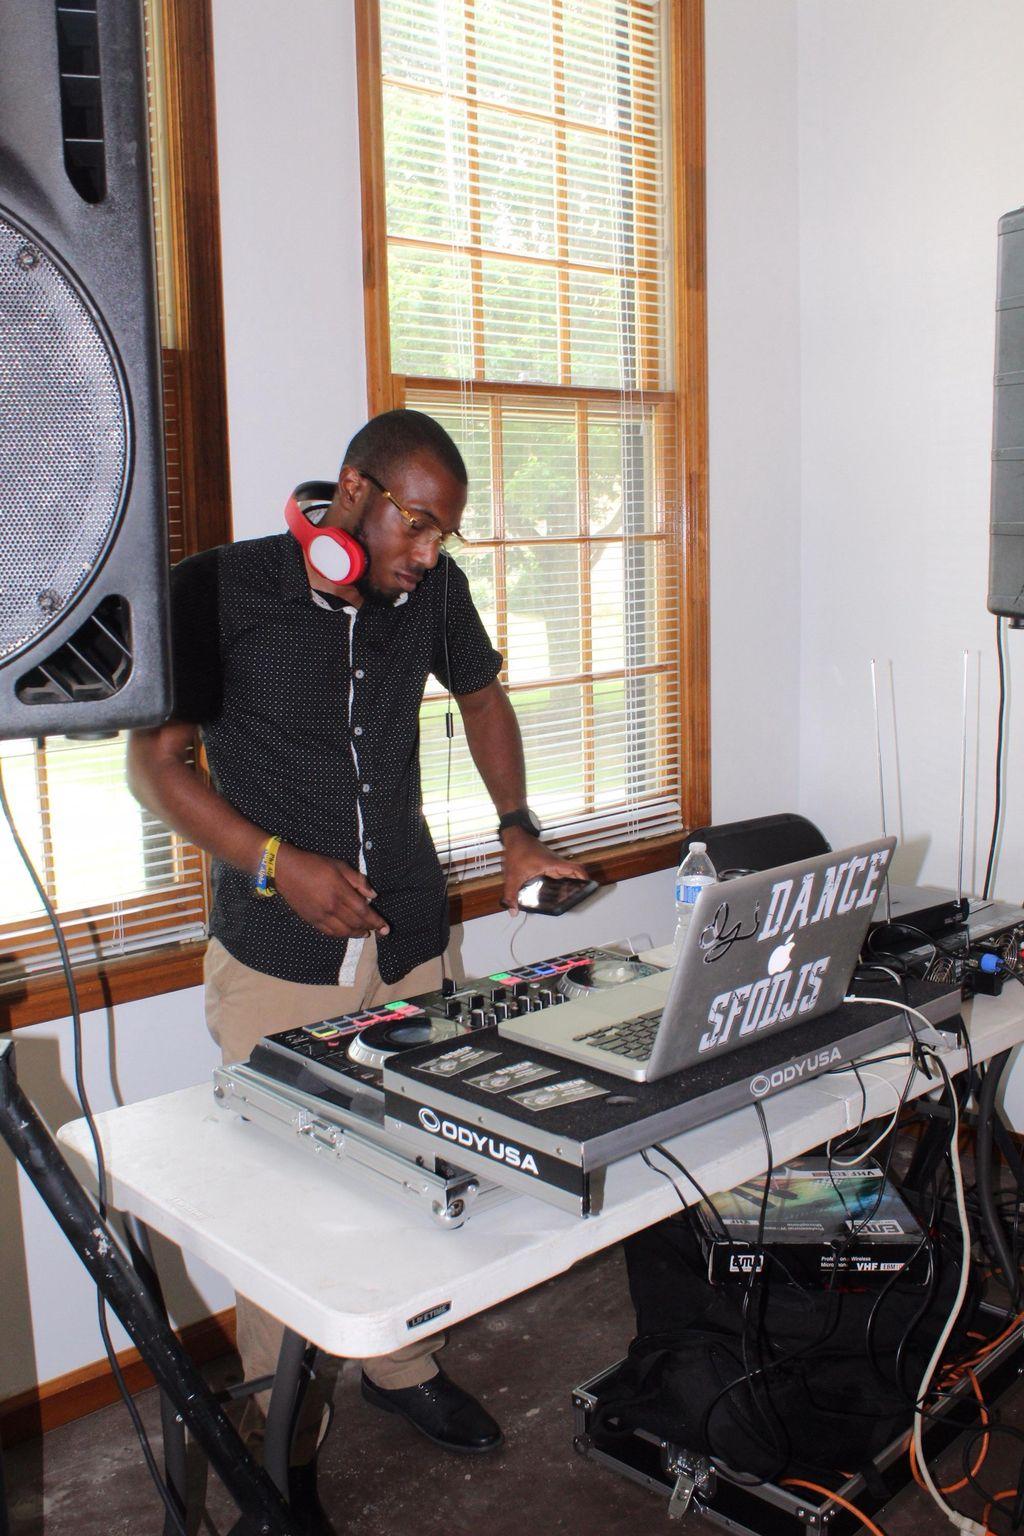 DJ Dan'ce Mobile DJ Services